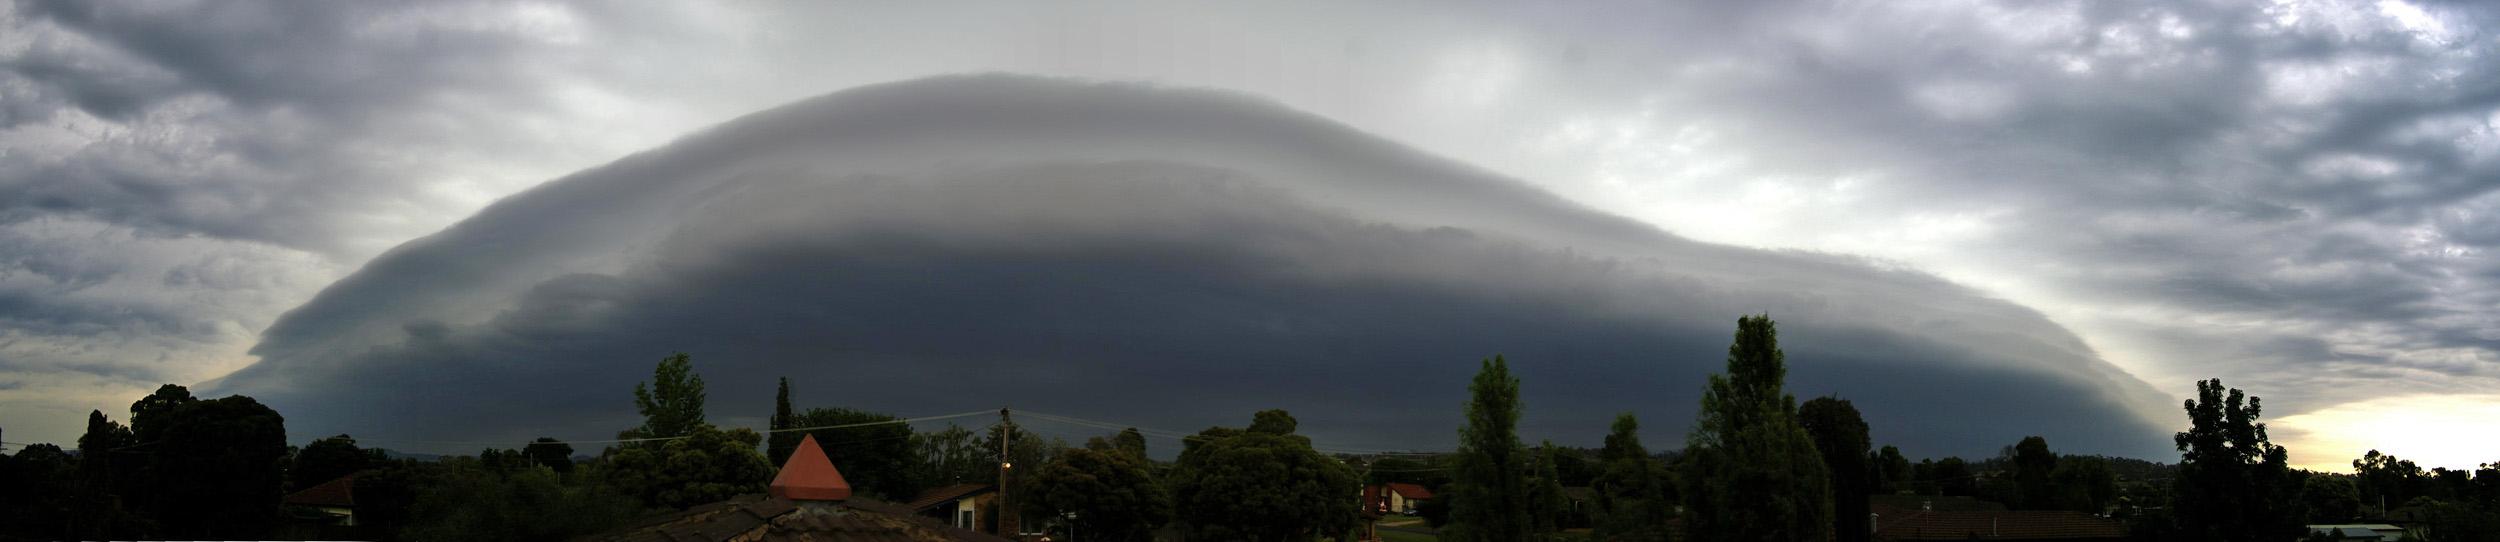 Thunderstorm_panorama